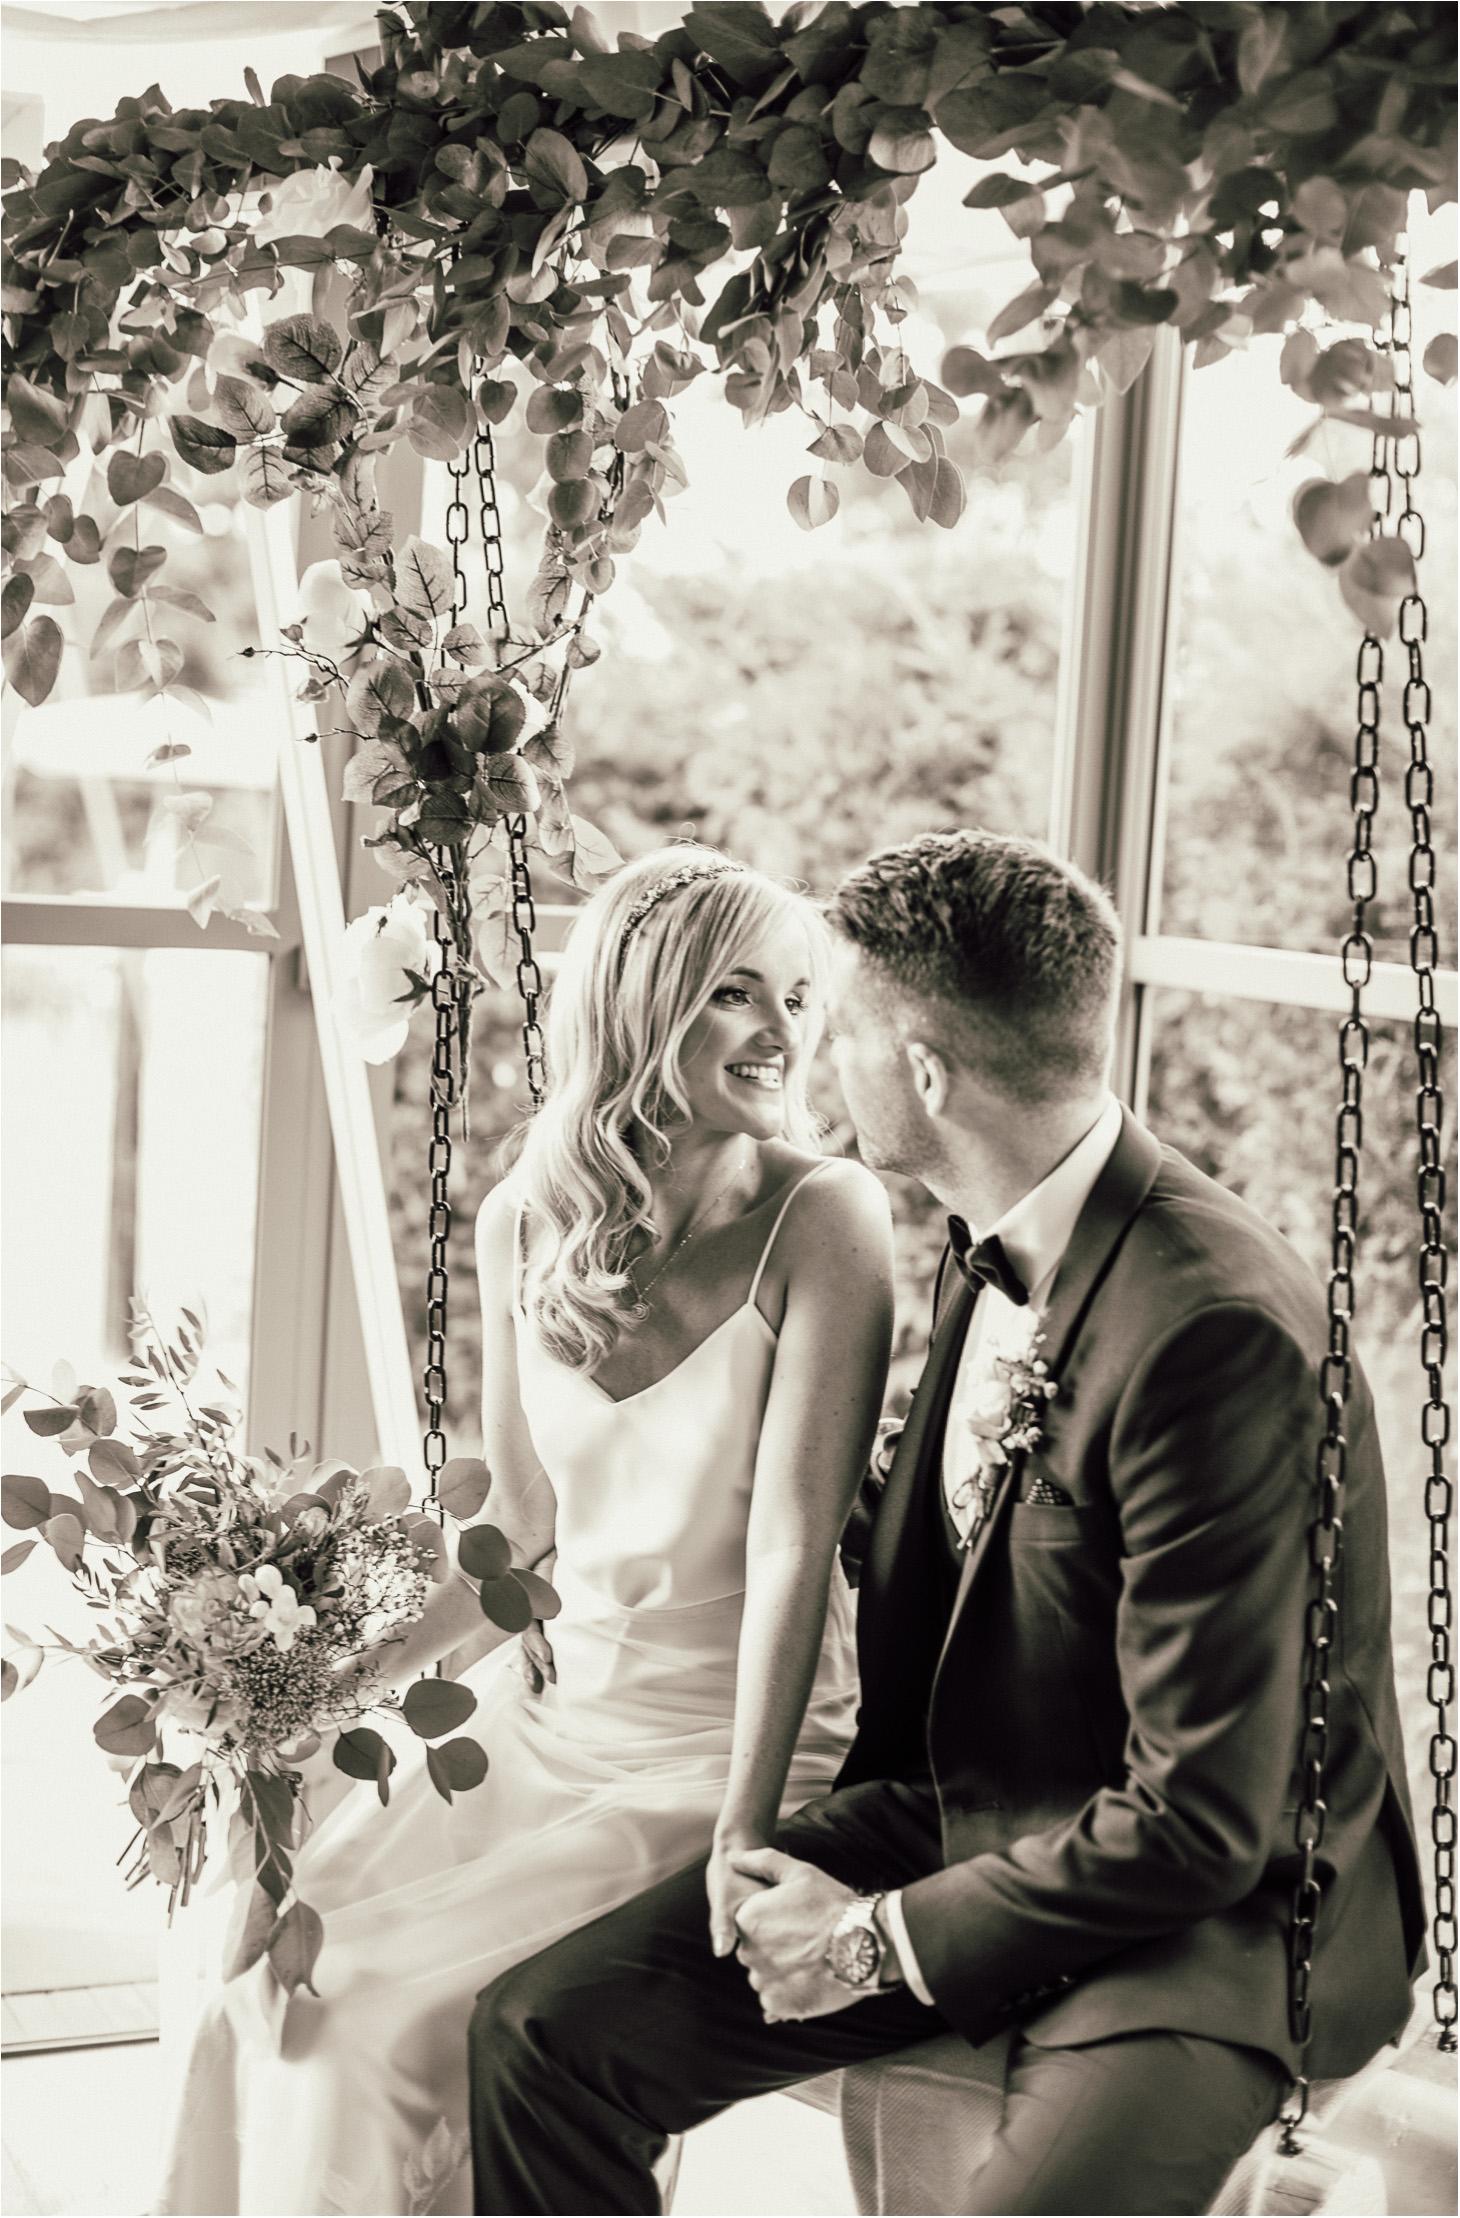 Virgina Lodge Photography. darren fitzpatrick. Wedding.27